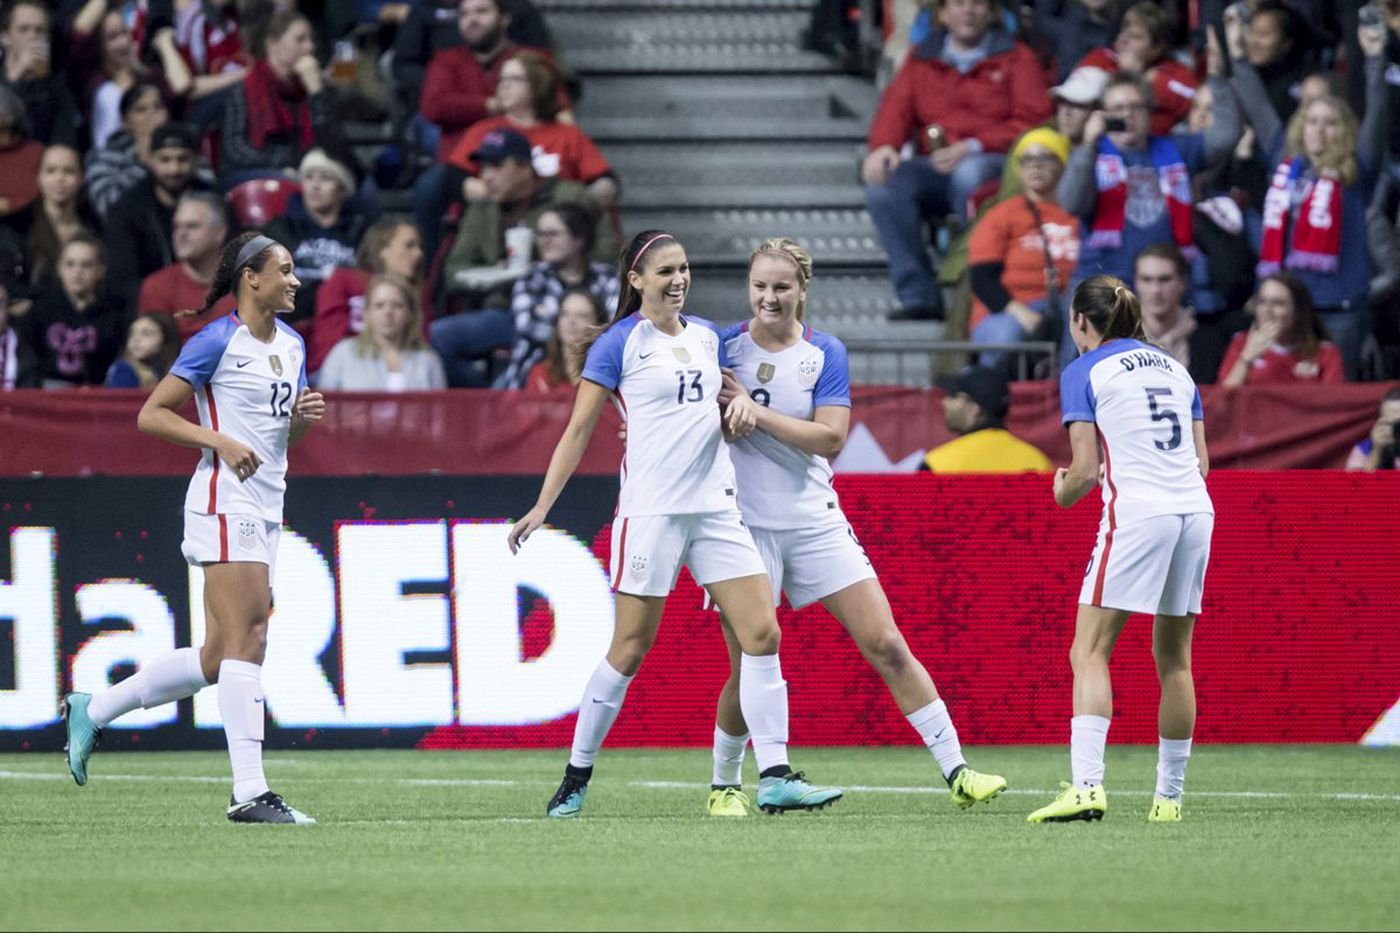 Alex Morgan scores as U.S. women's soccer team ties Canada 1-1